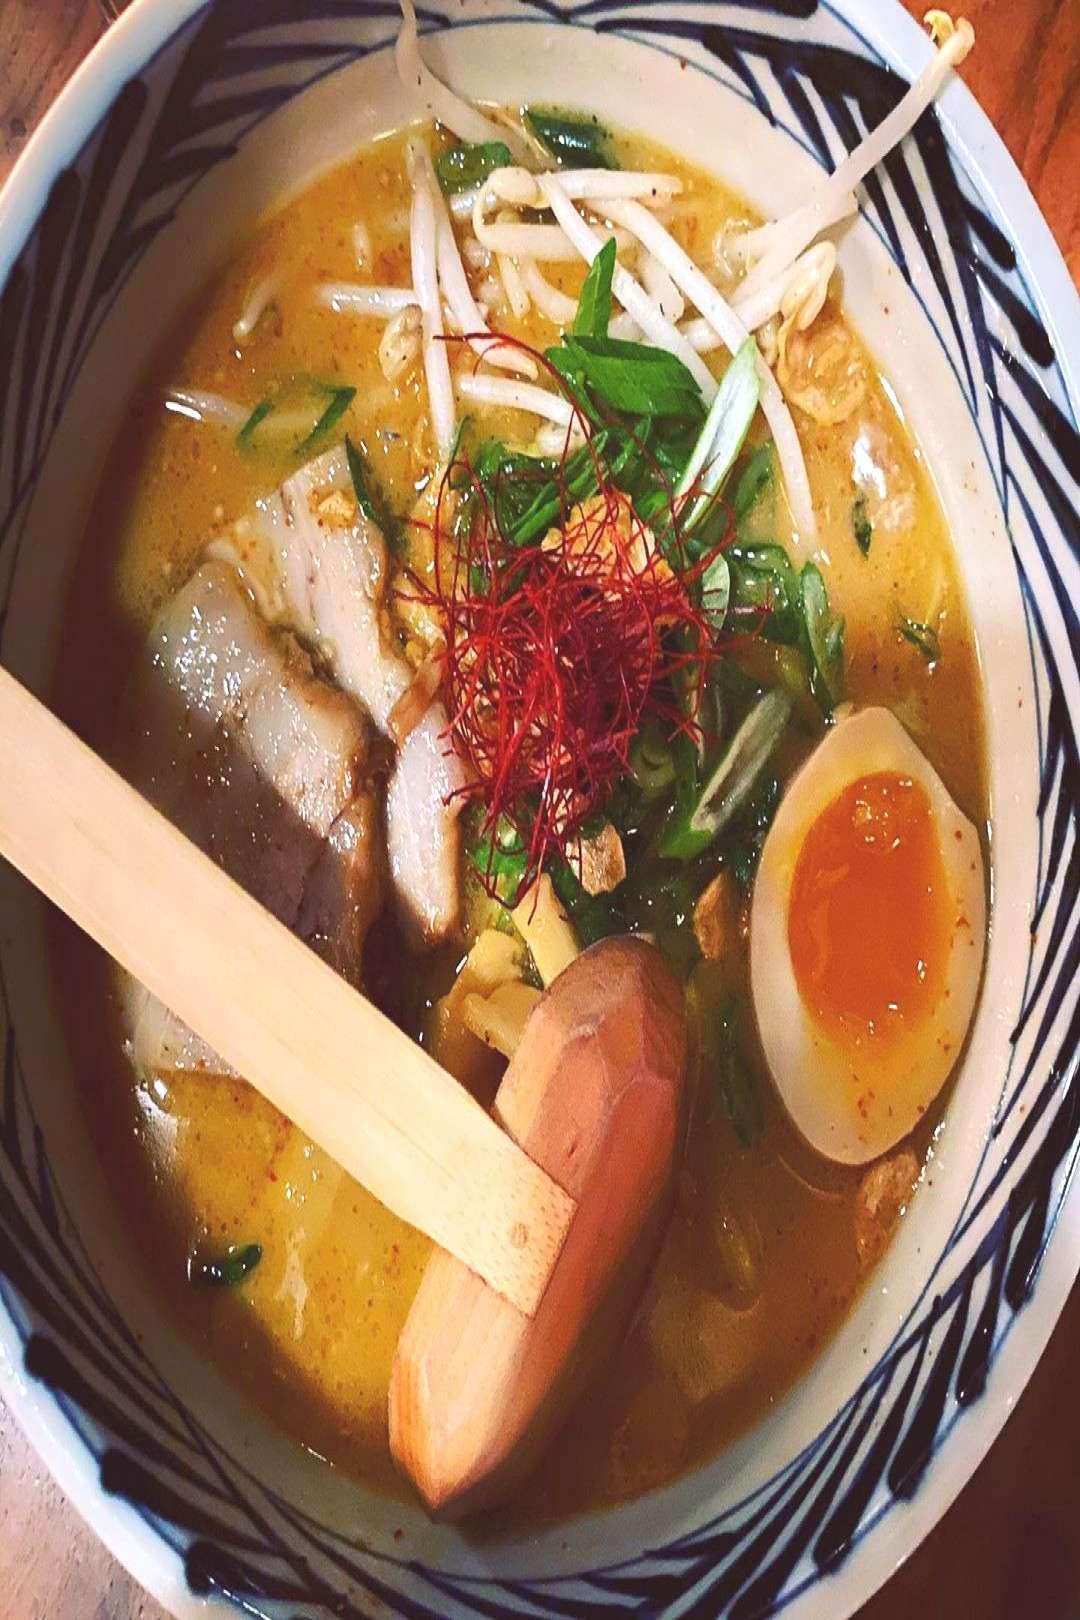 #ramennoodles #warms #ramen #soul #food #the warms the soul #ramen #ramennoodlesYou can find Ramen noodles and more on our website.warms the soul #ramen #ramennoodles